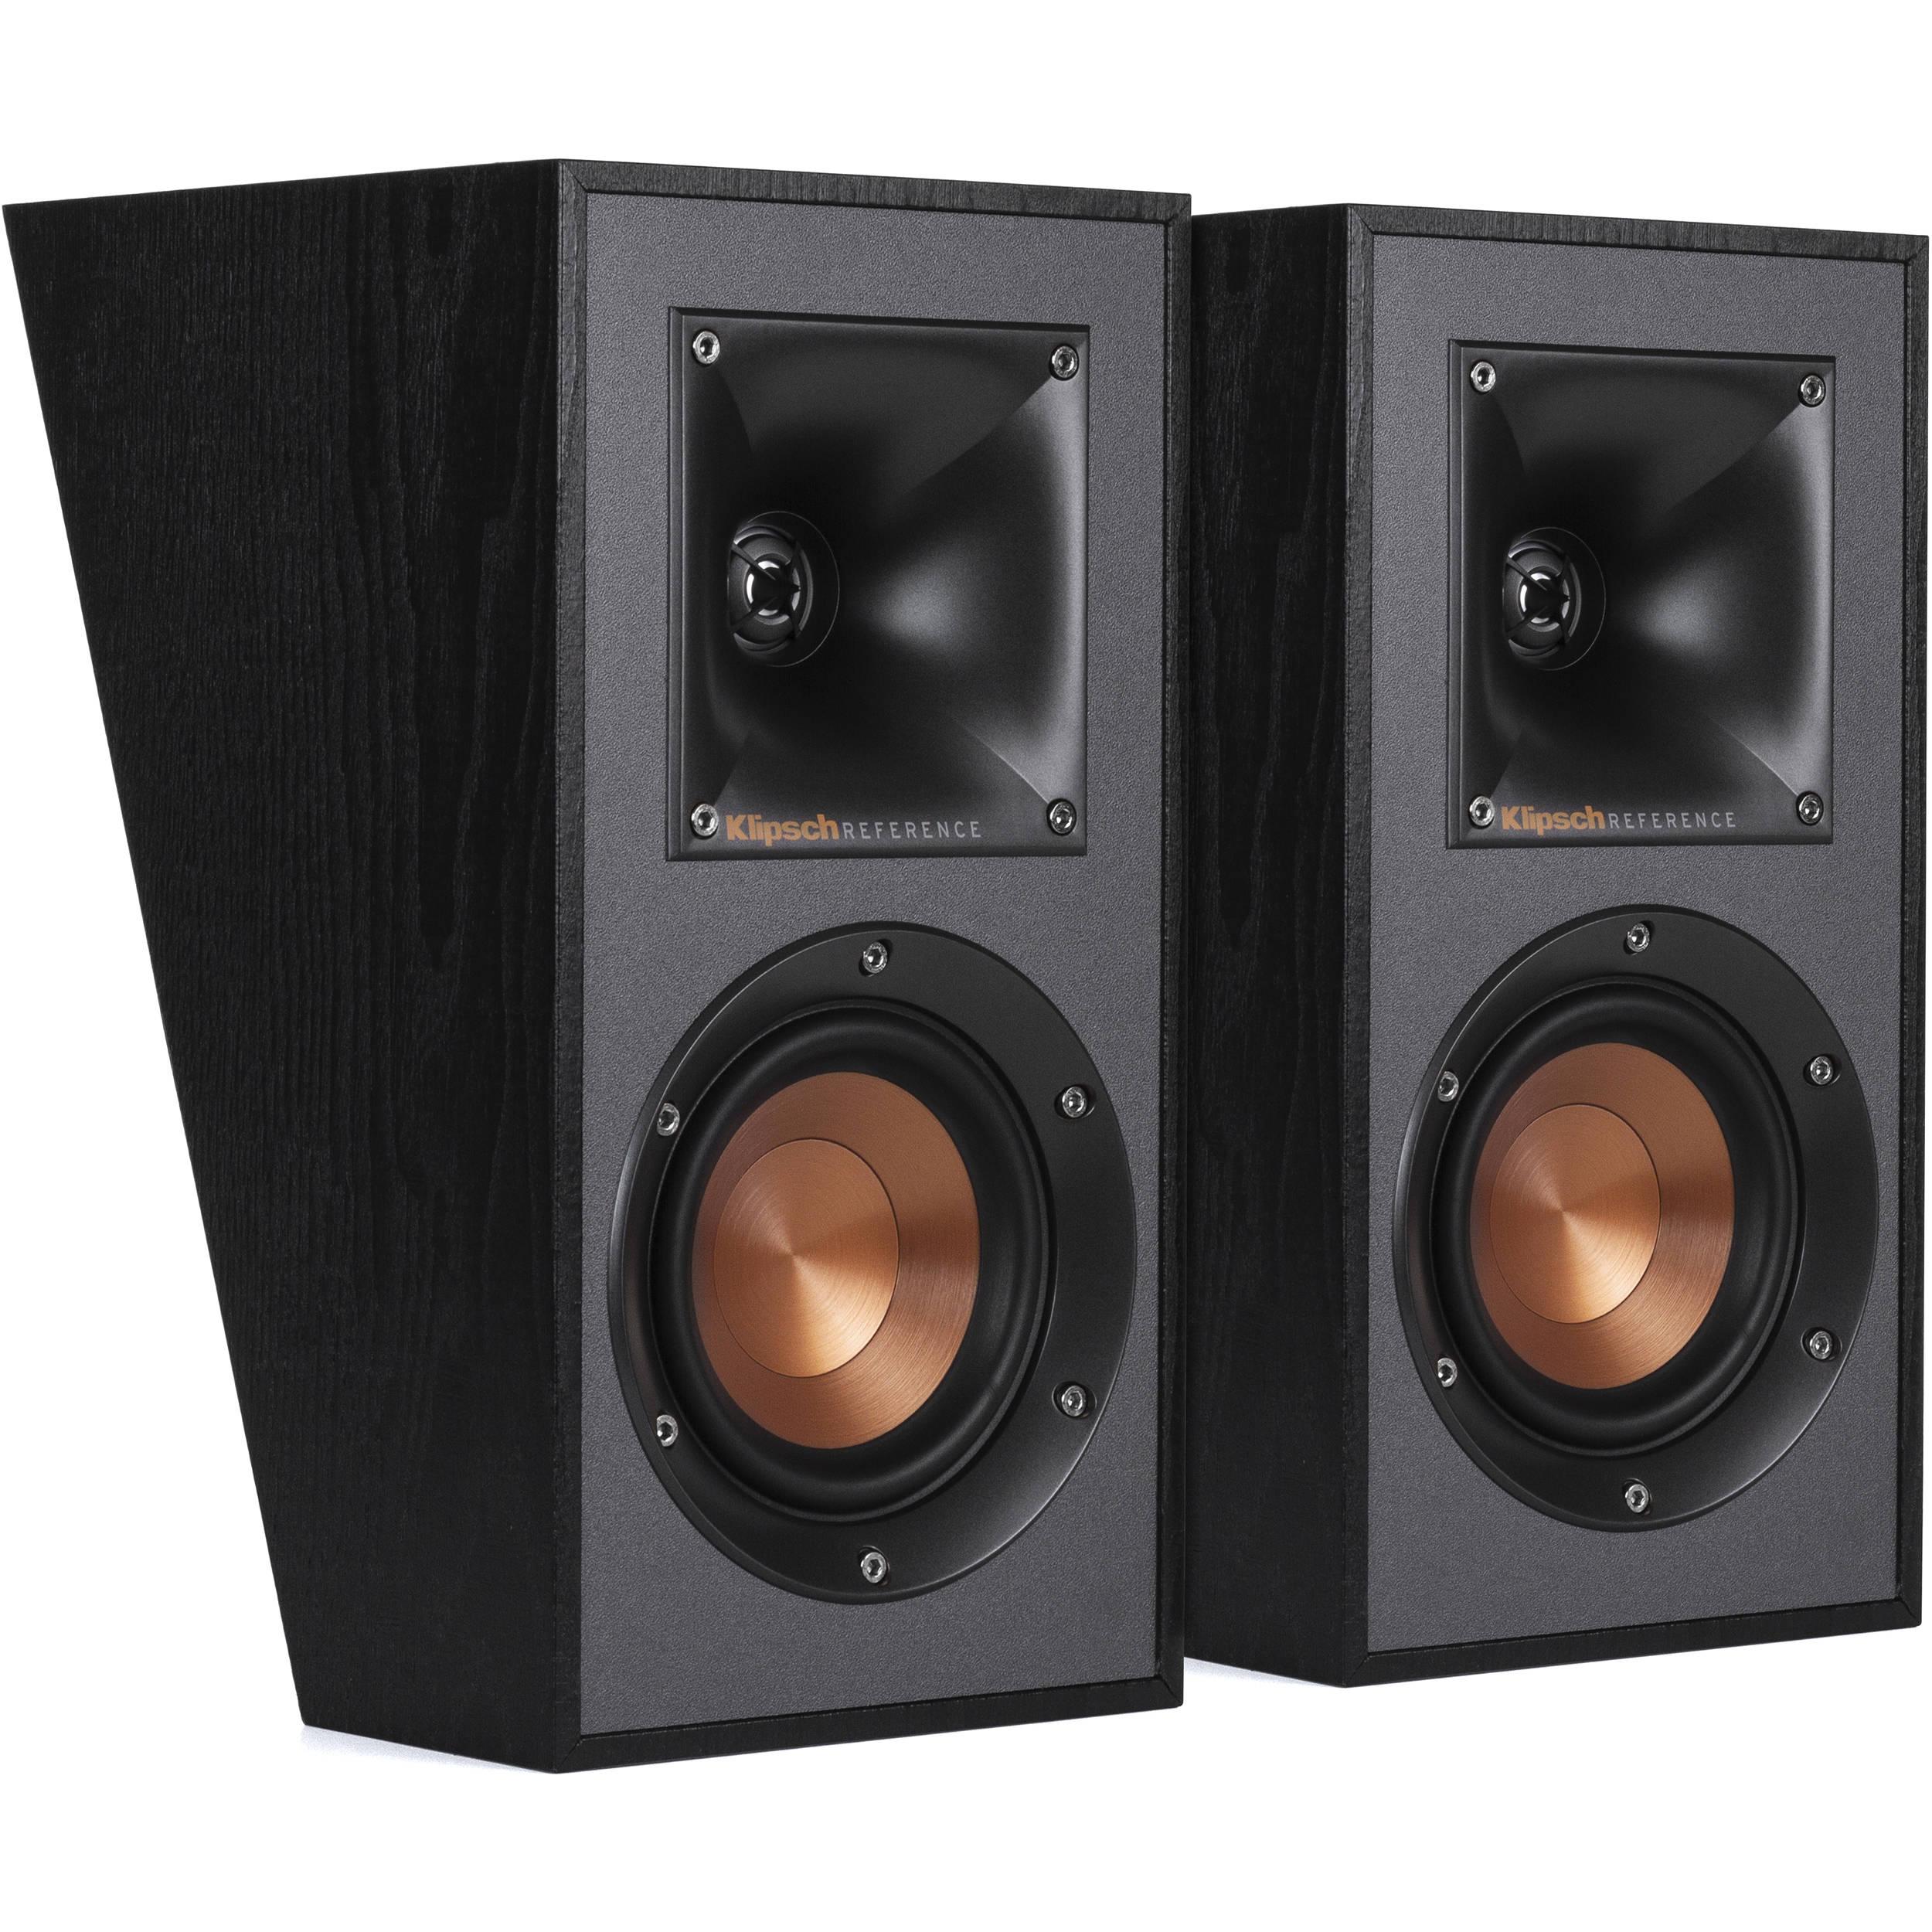 Klipsch Surround Sound >> Klipsch Reference R 41sa Dolby Atmos Speakers Black Pair